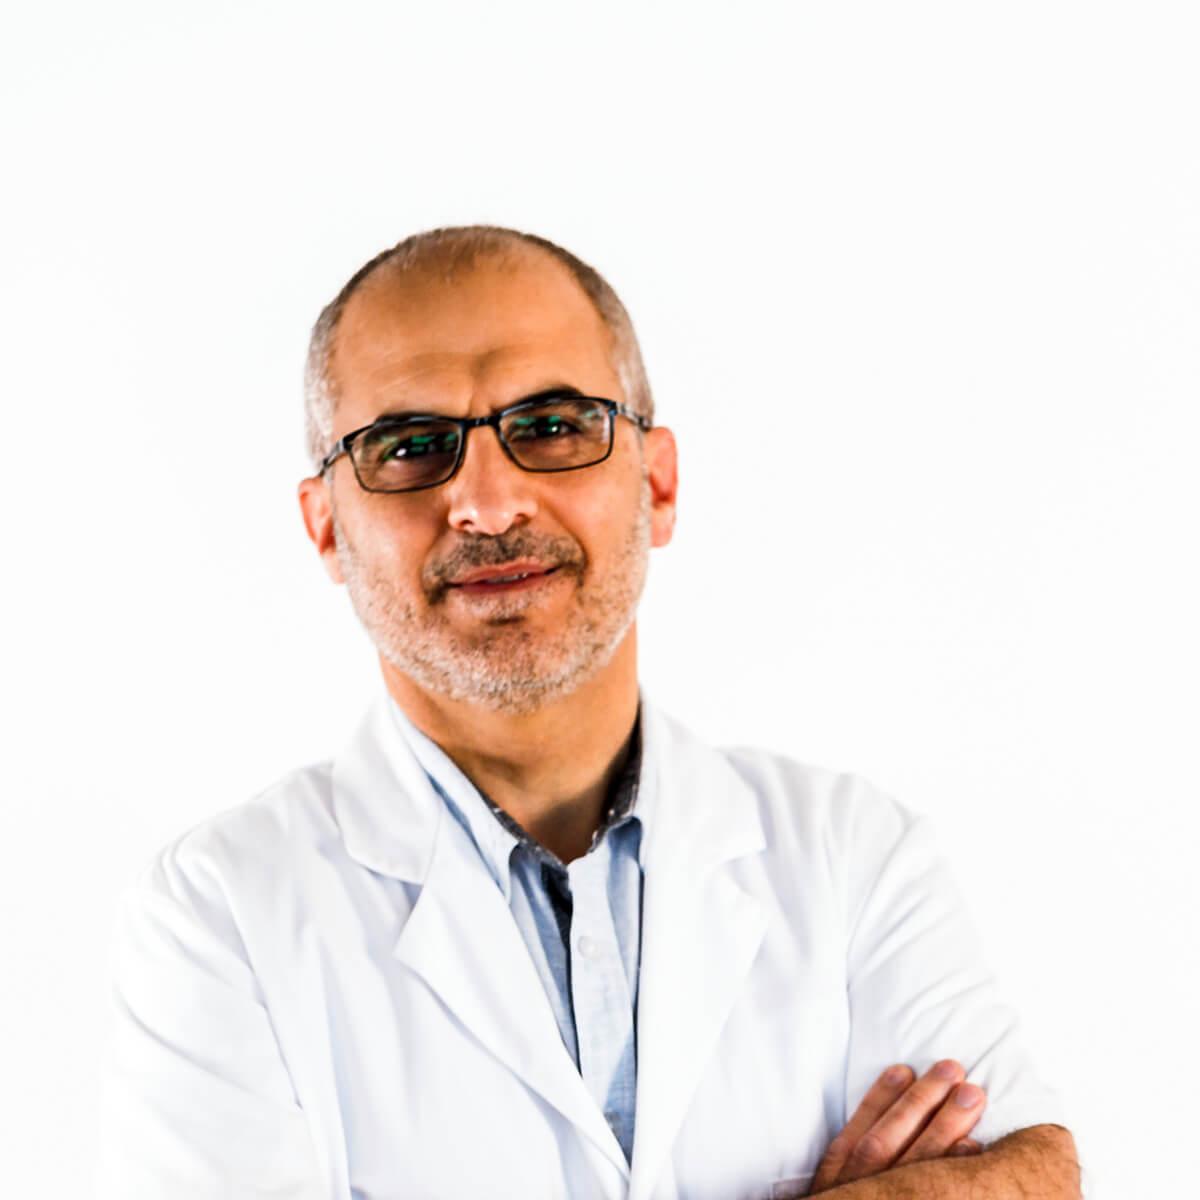 Majed AL KHOURI